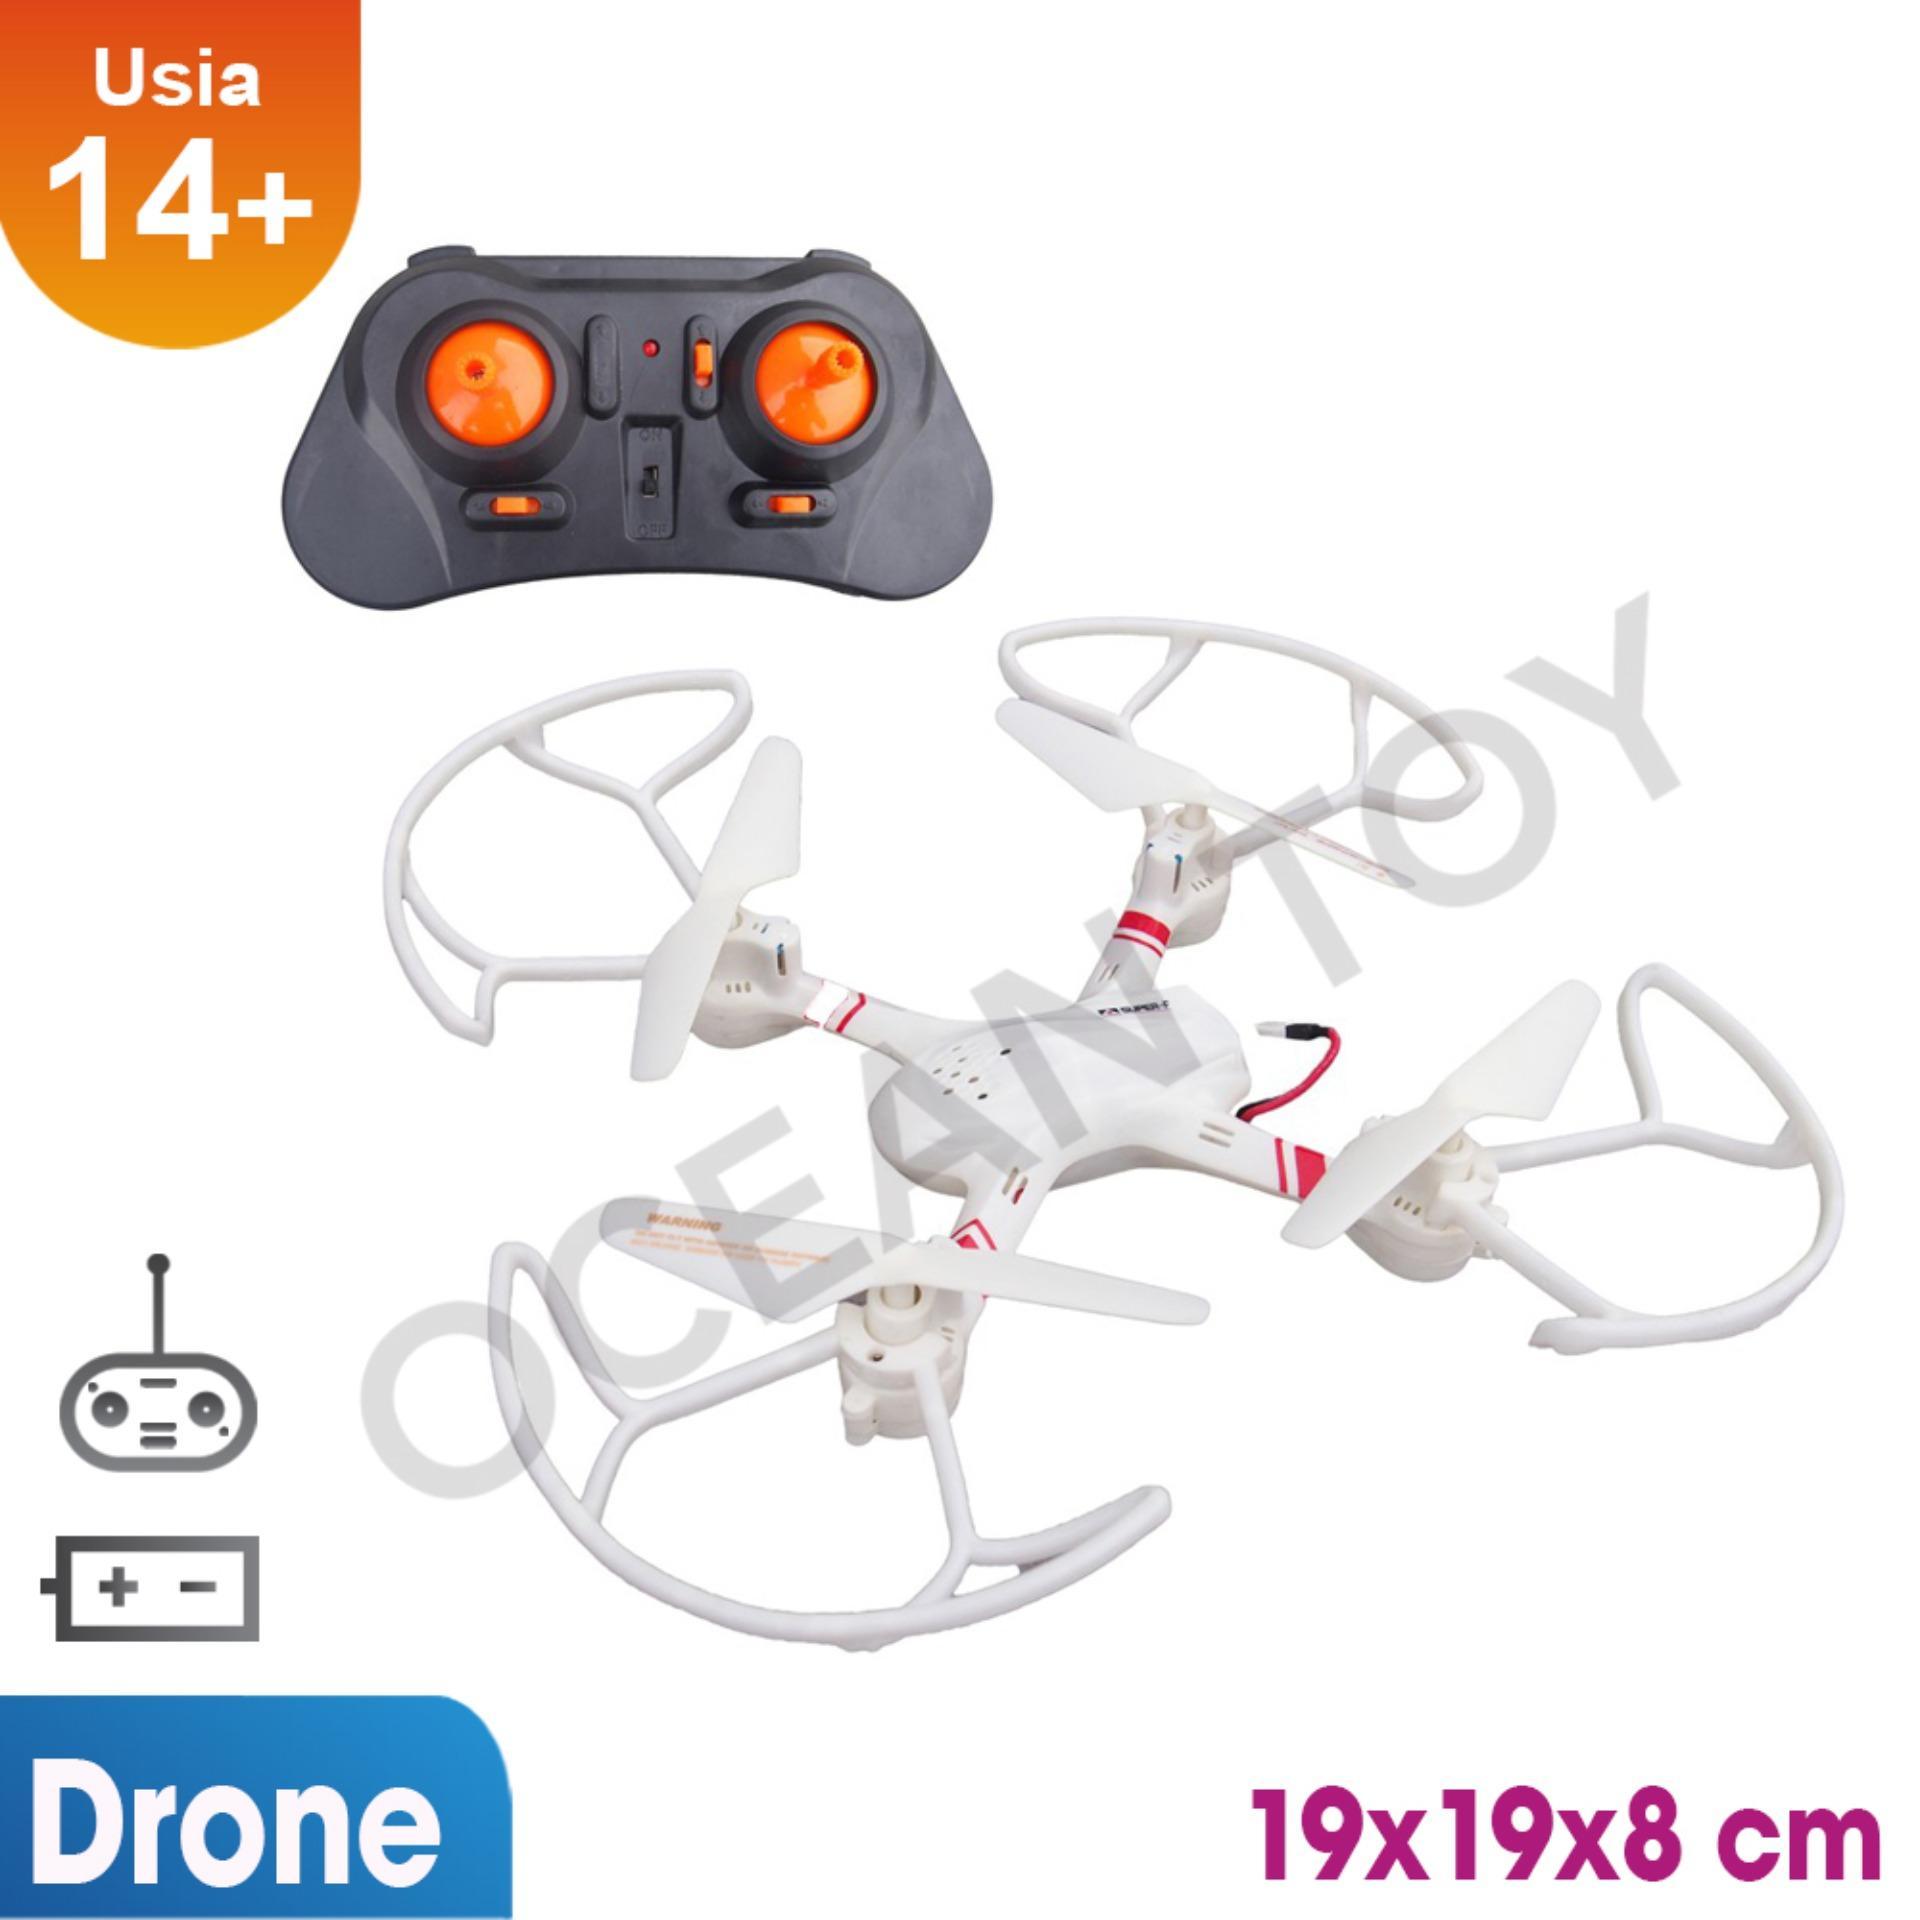 Ocean Toy Drone Murah Quadcopters Super F 33043 - White